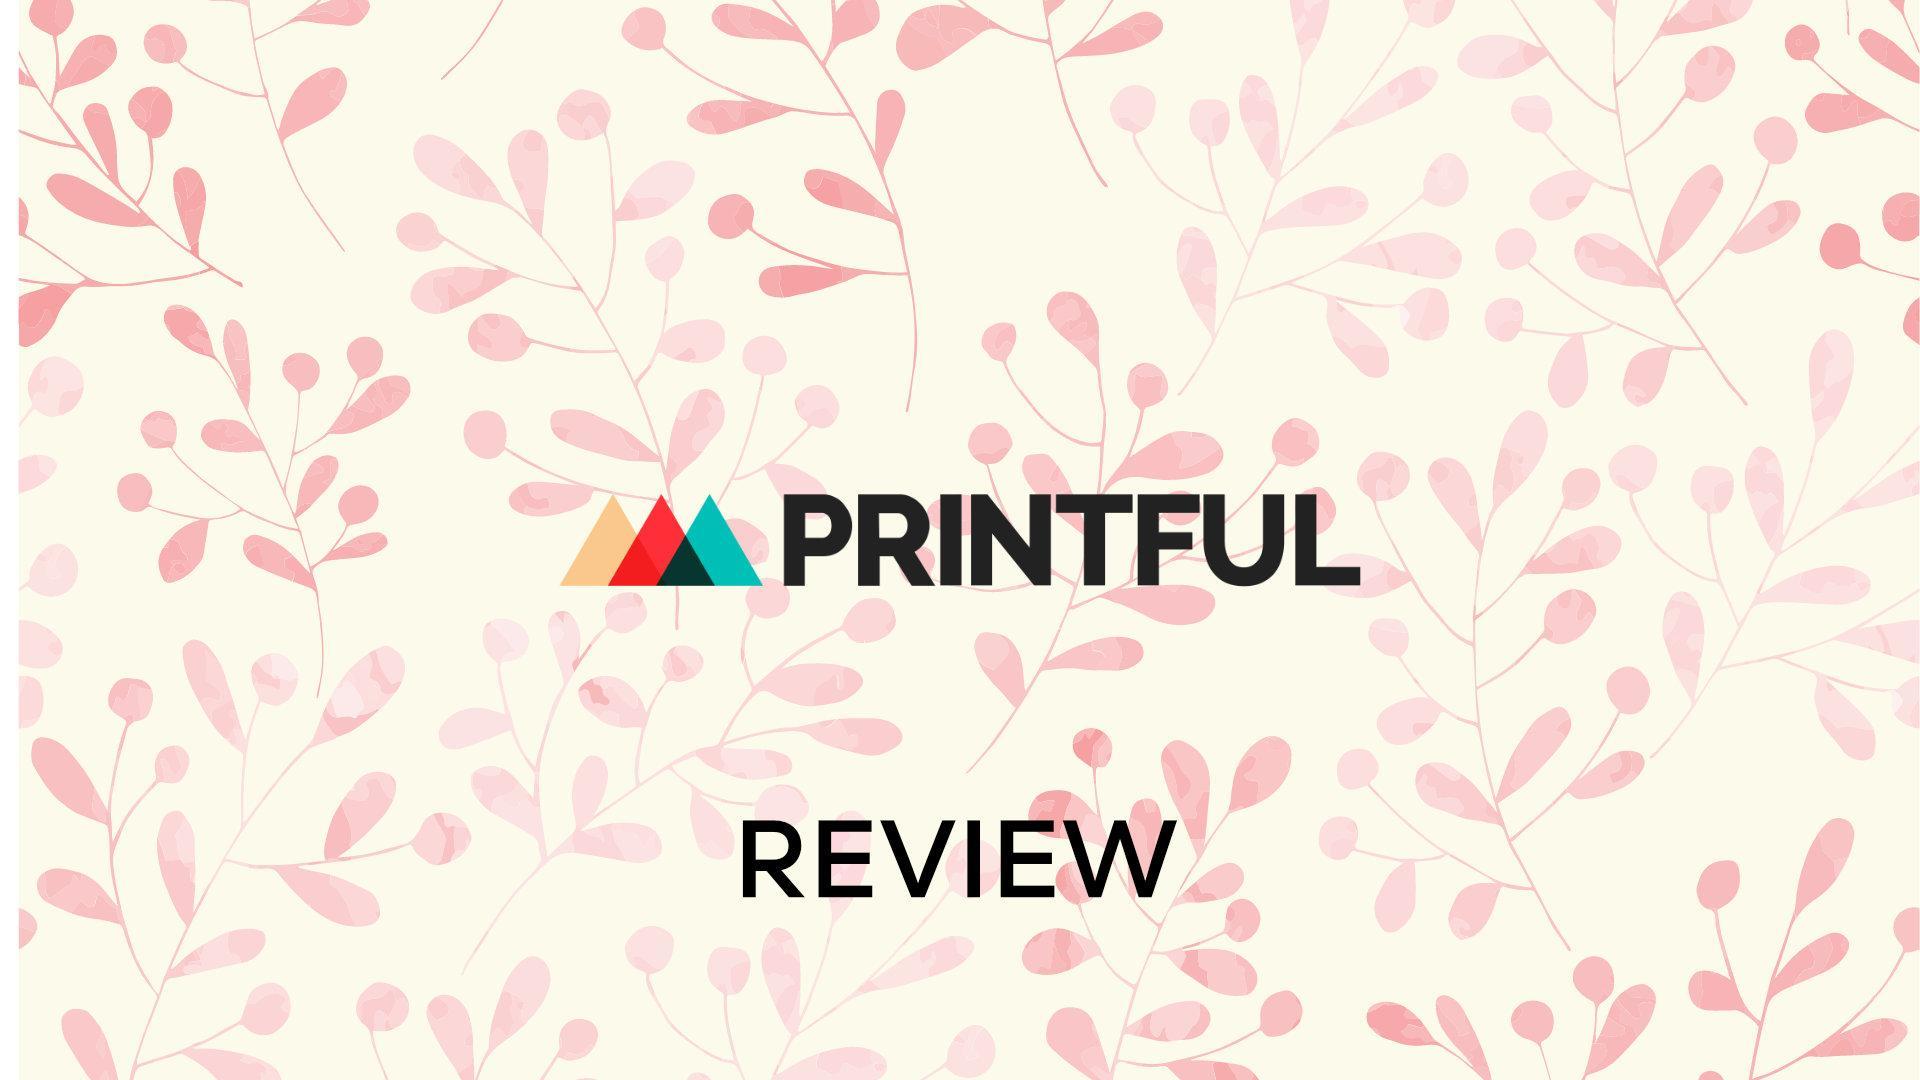 Printful Review: Dropship Your Way To Success